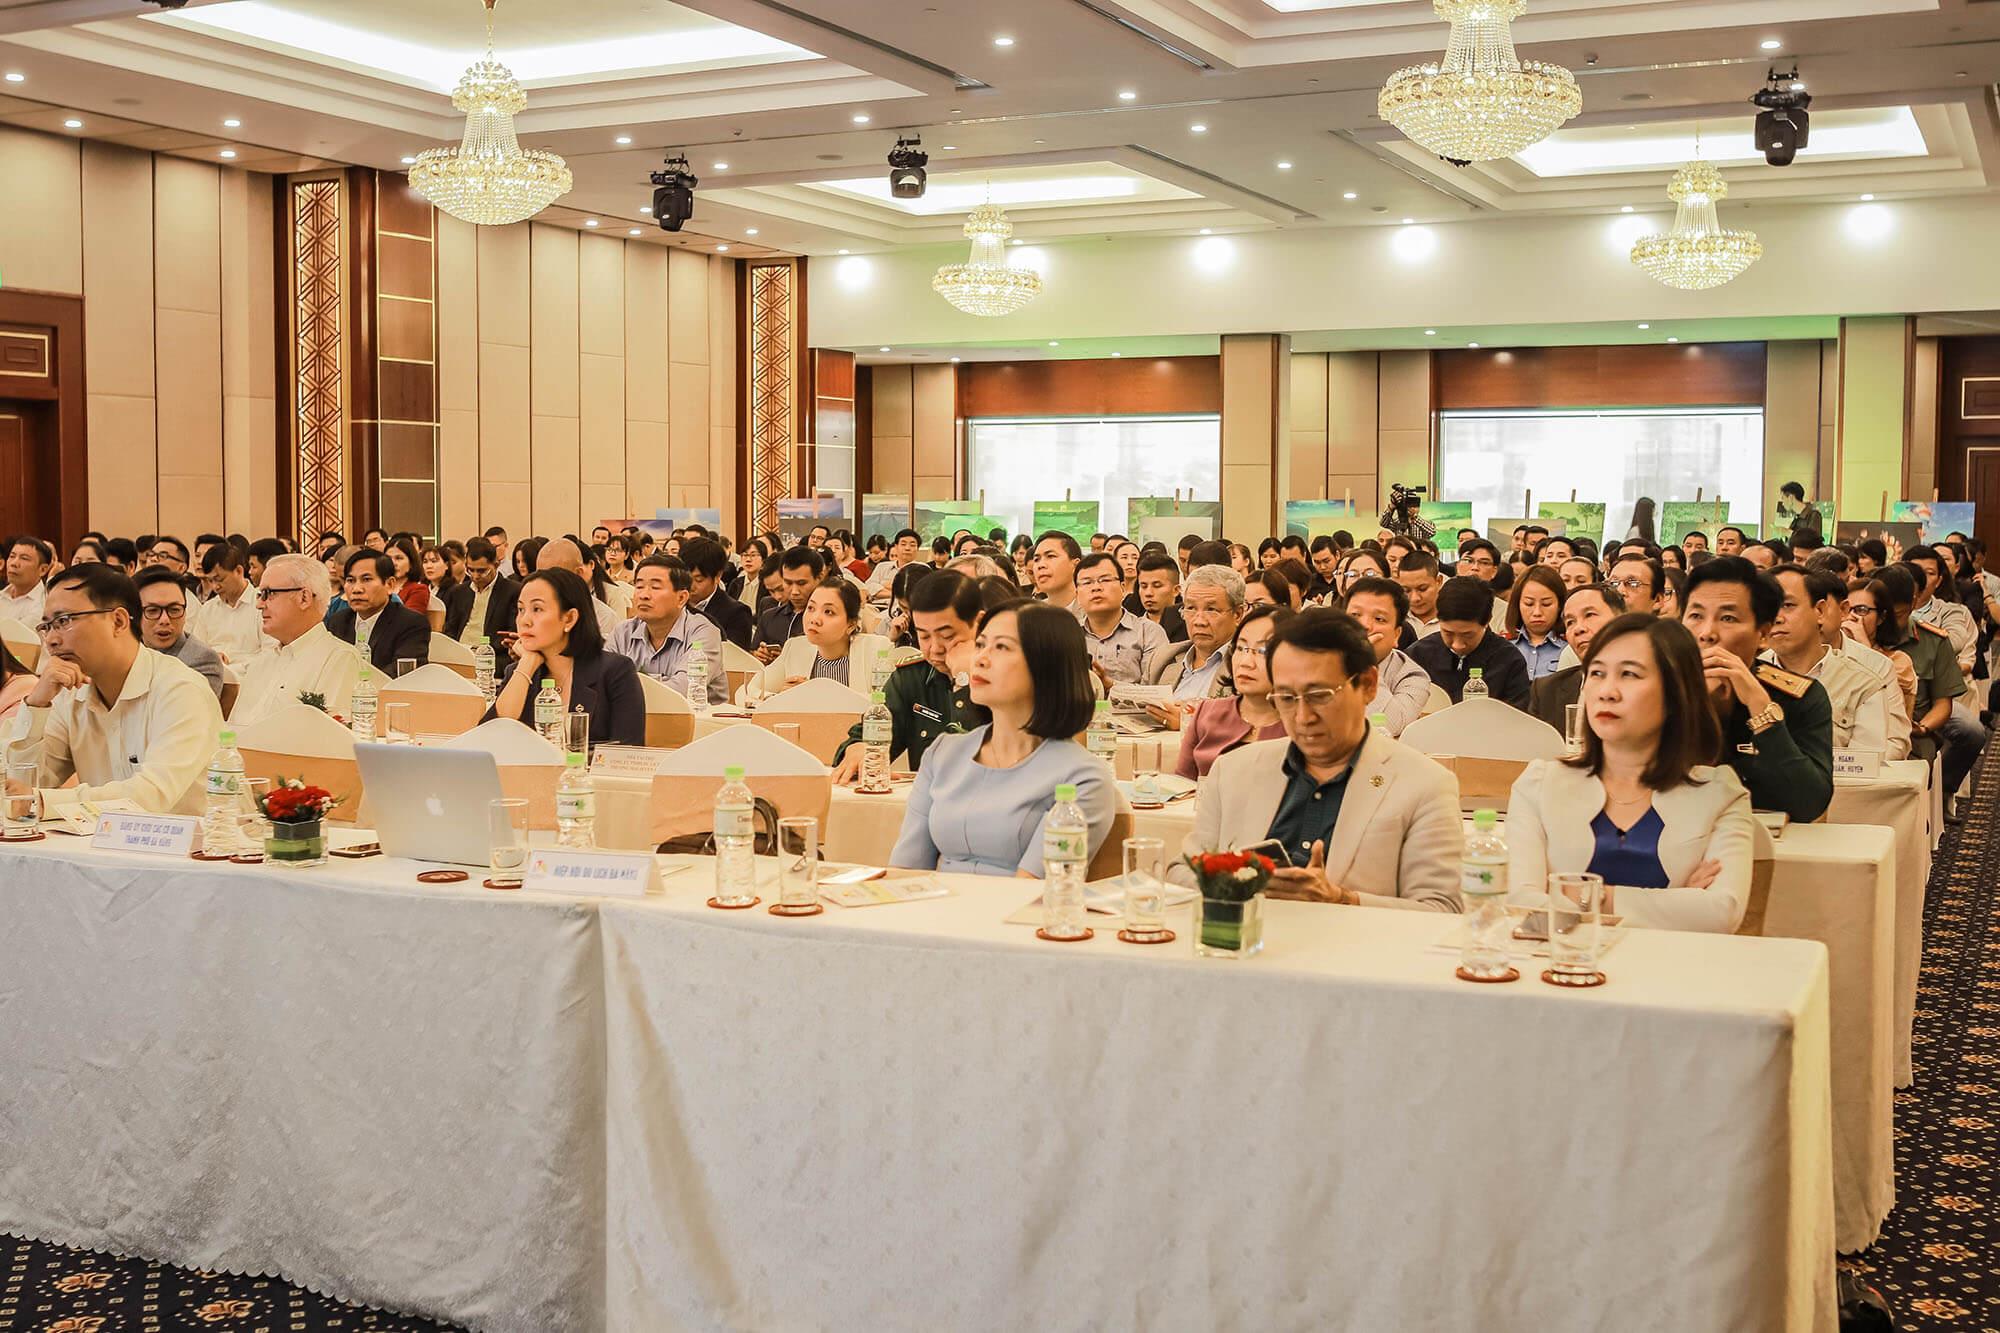 Hoi Nghi Tong Ket Nganh Du Lich Da Nang Nam 2019 Trien Khai Nhiem Vu Nam 2020 03